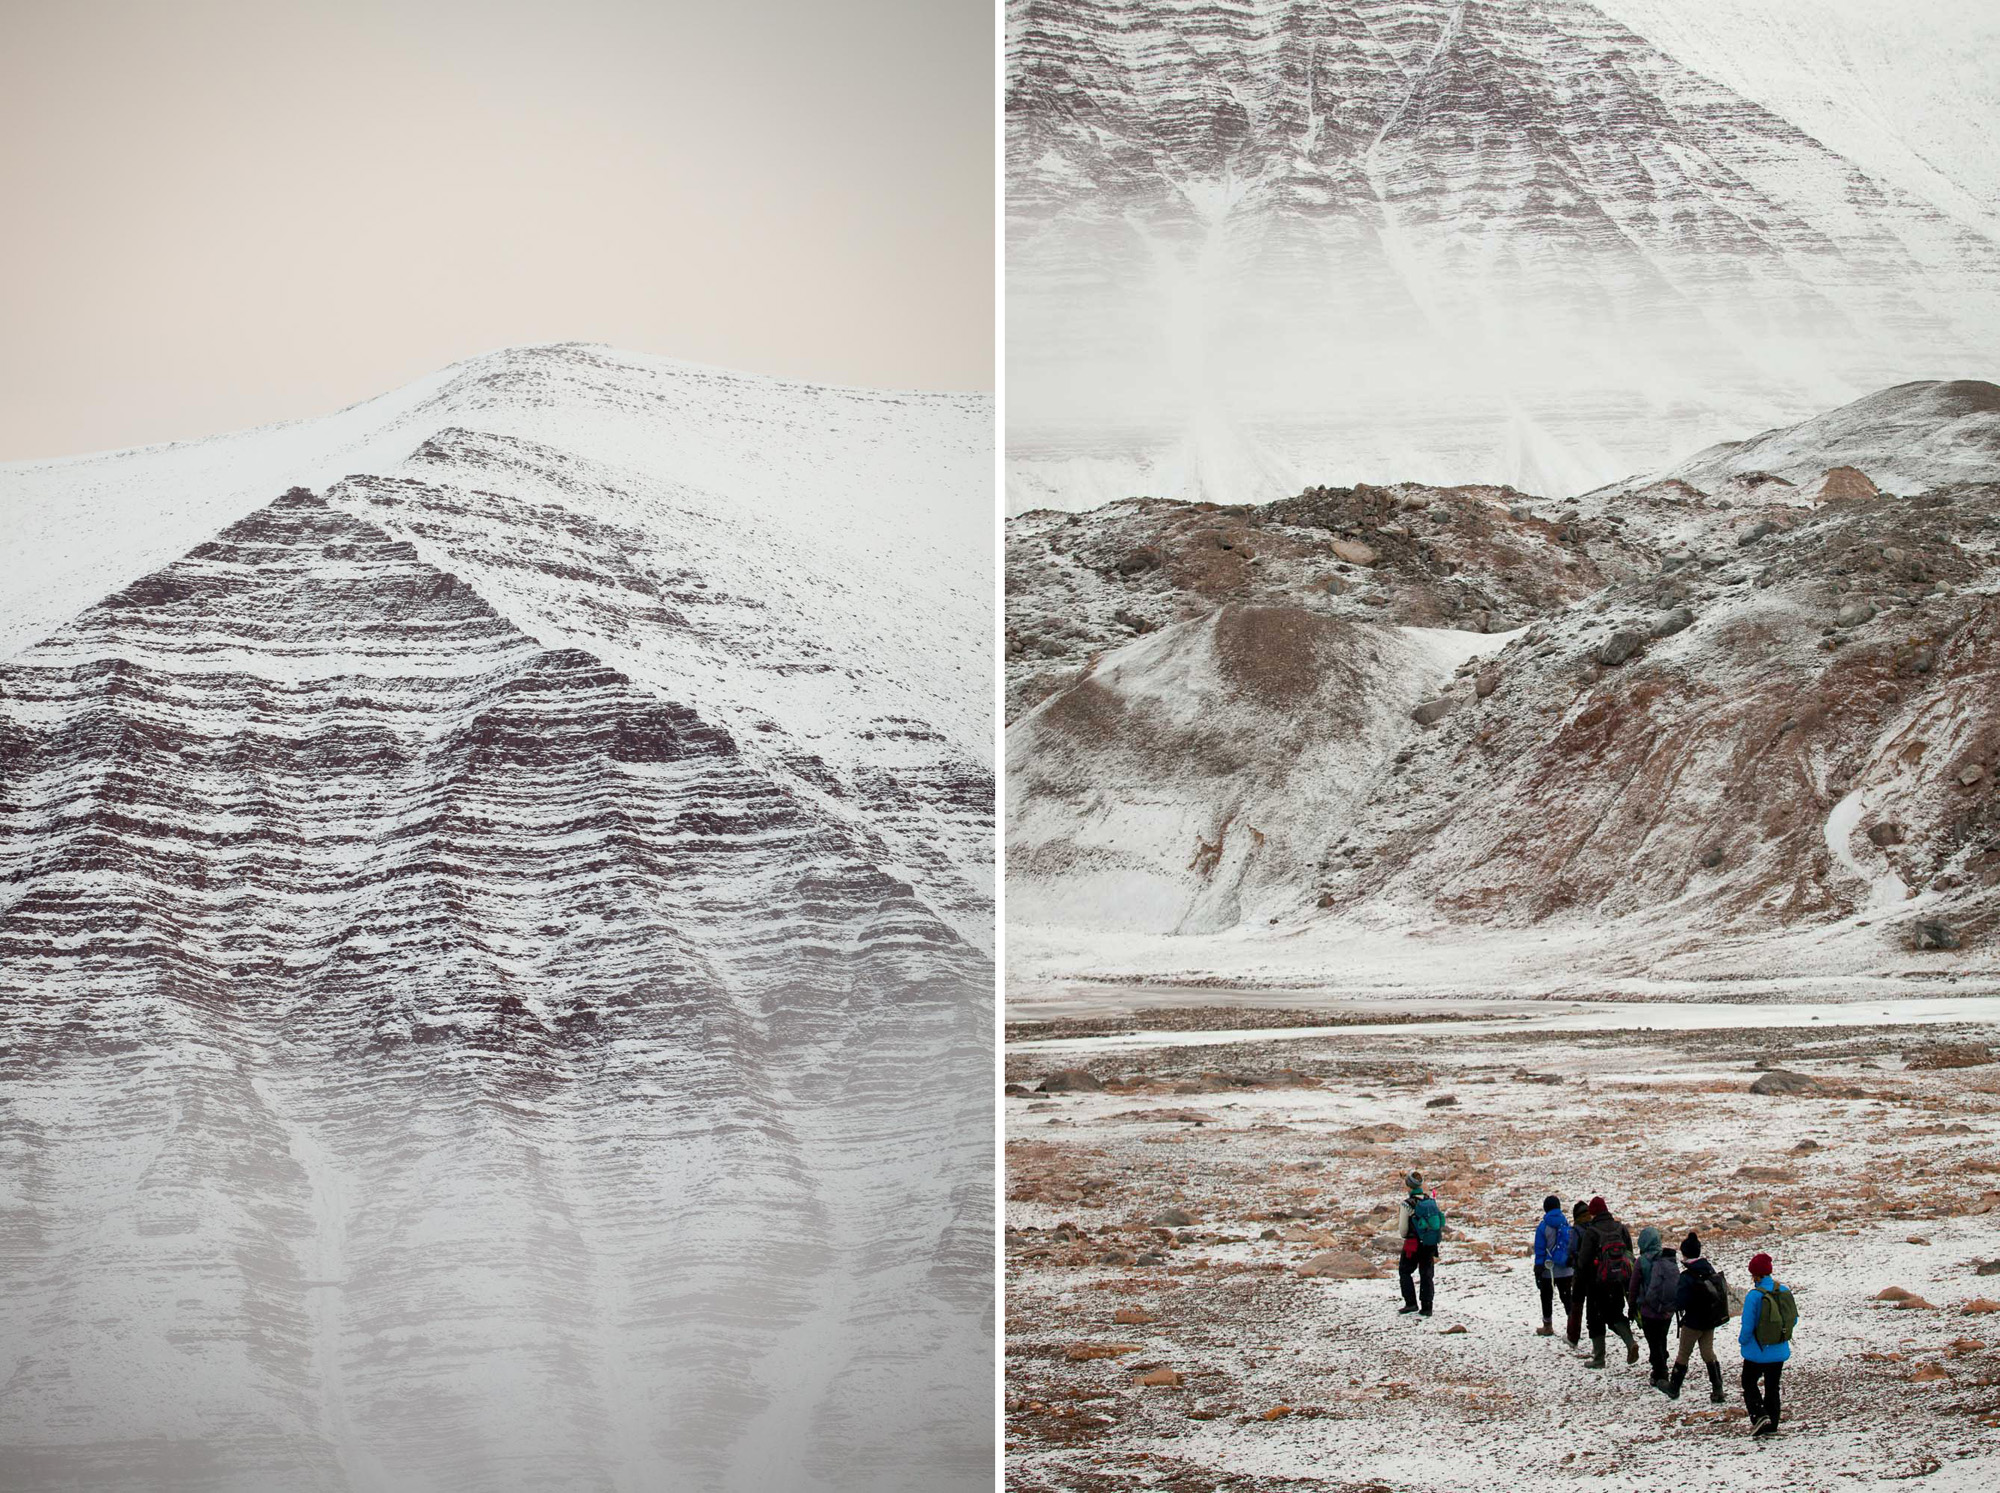 arctic-svalbard-03.jpg